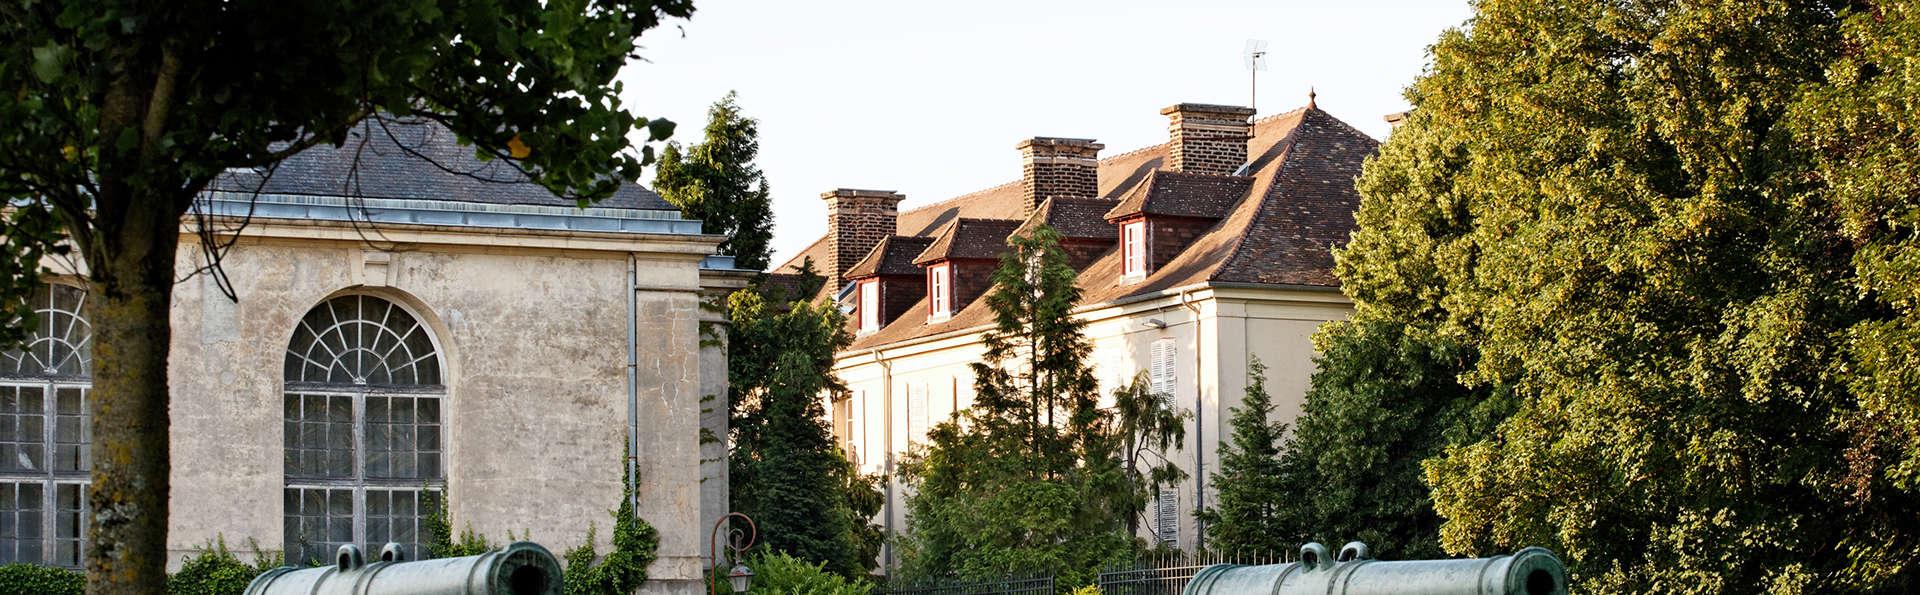 Hôtel La Petite Verrerie - EDIT_exterior1.jpg